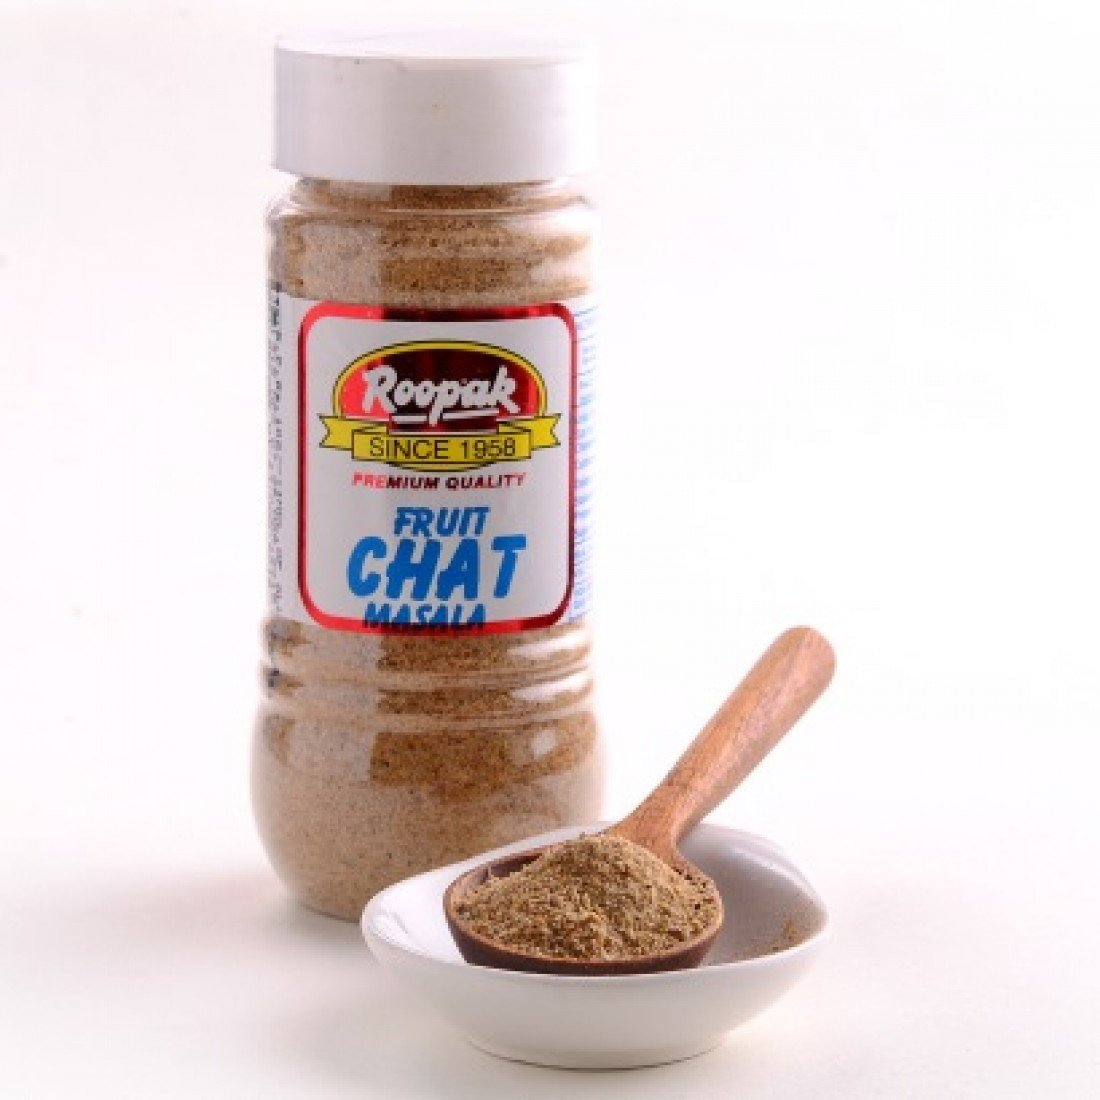 Roopak Popular brand in the world Delhi Fruit Chat Masala supreme Indian - Seasoning Spice Powder